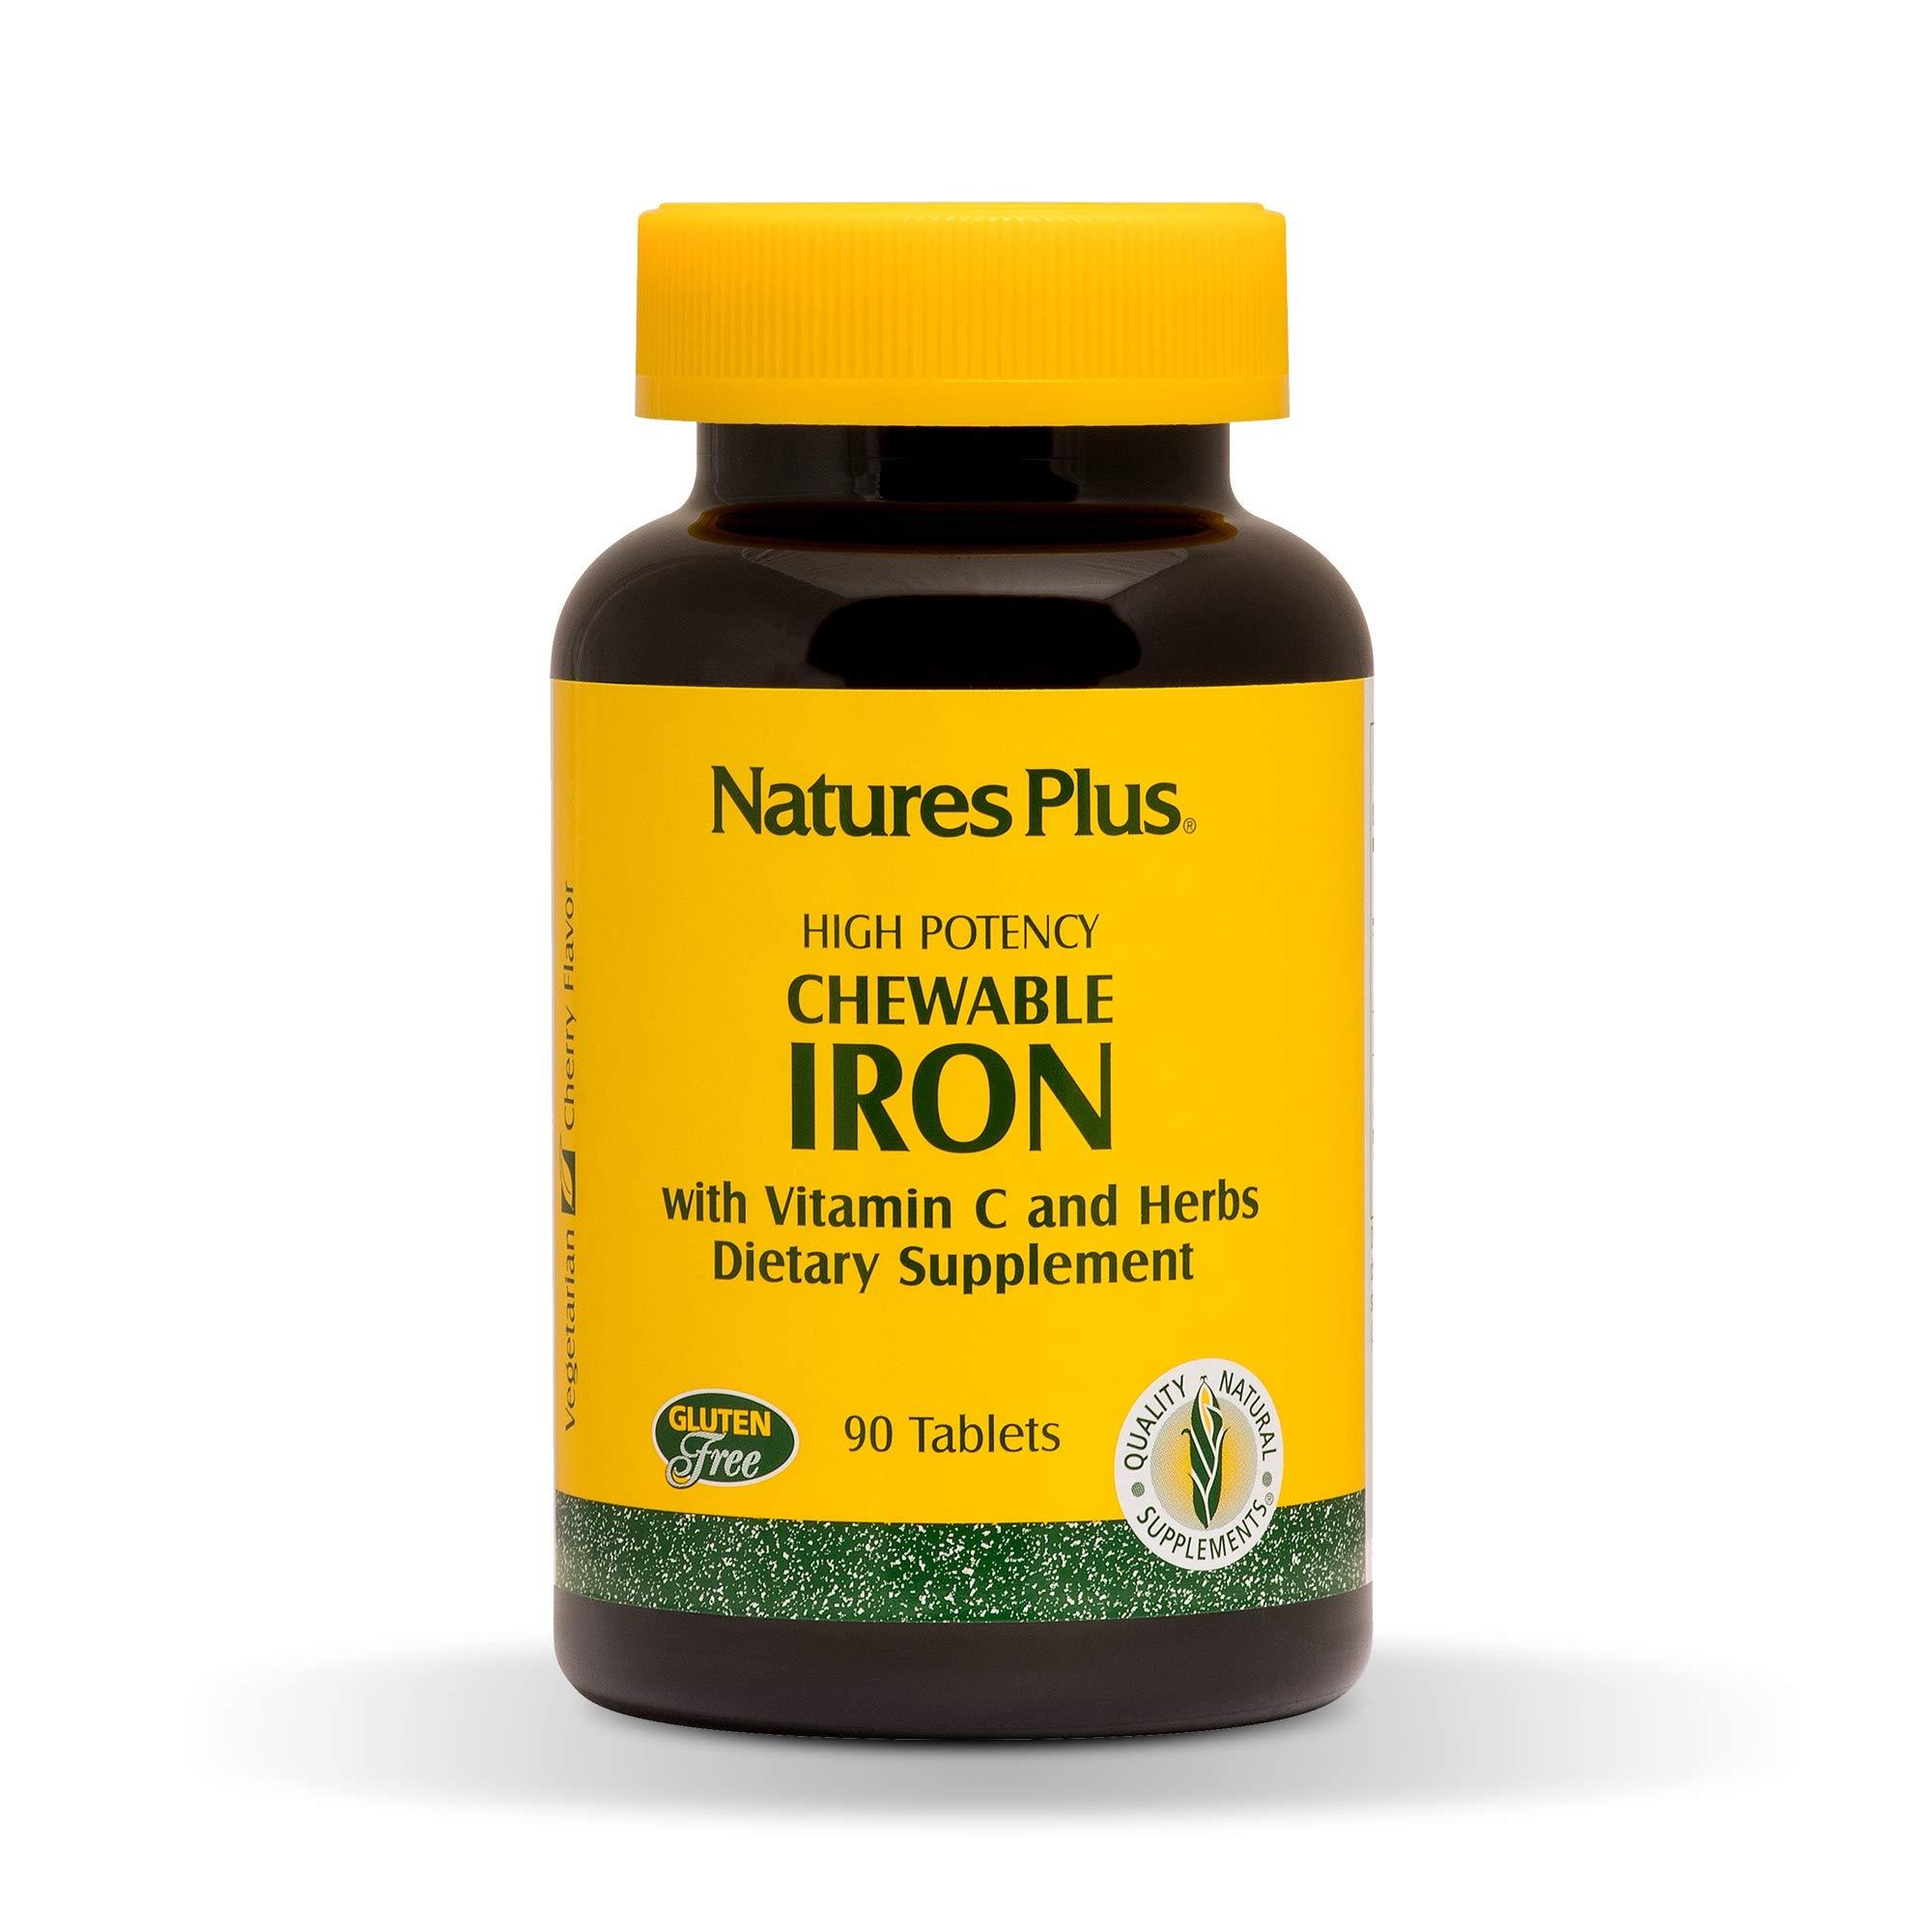 NaturesPlus Chewable Iron